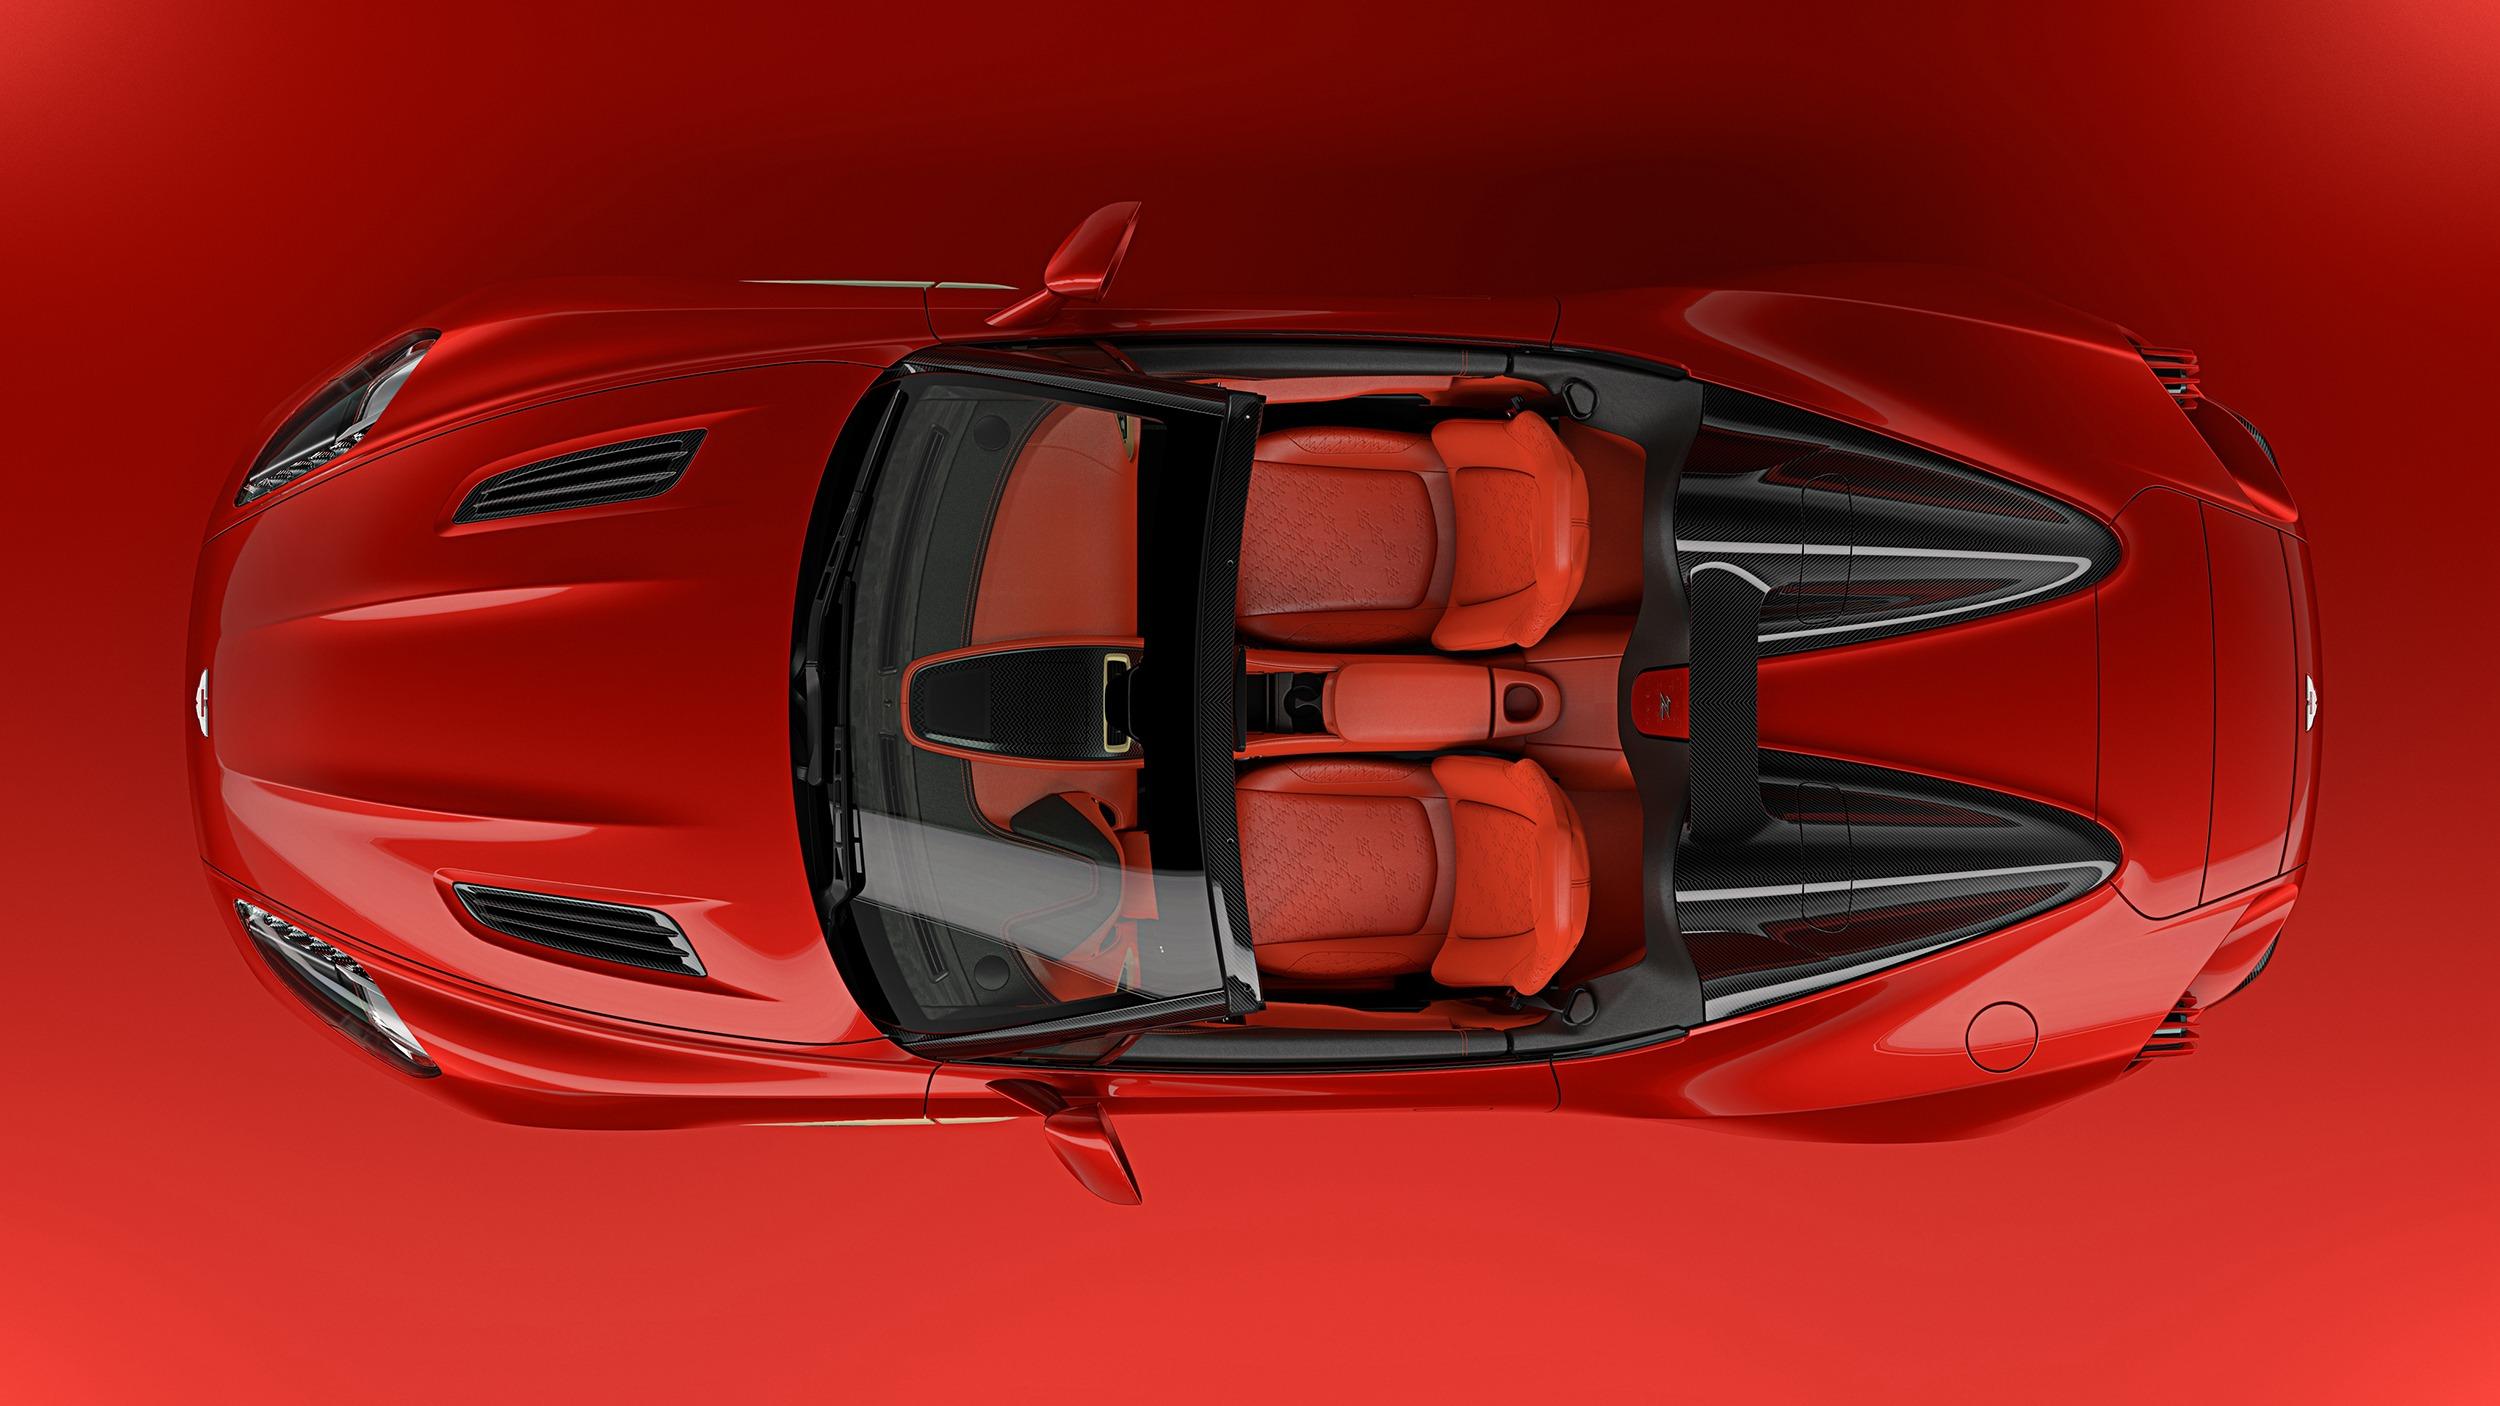 2017-Zagato-Aston-Martin-Vanquish-Speedster-06